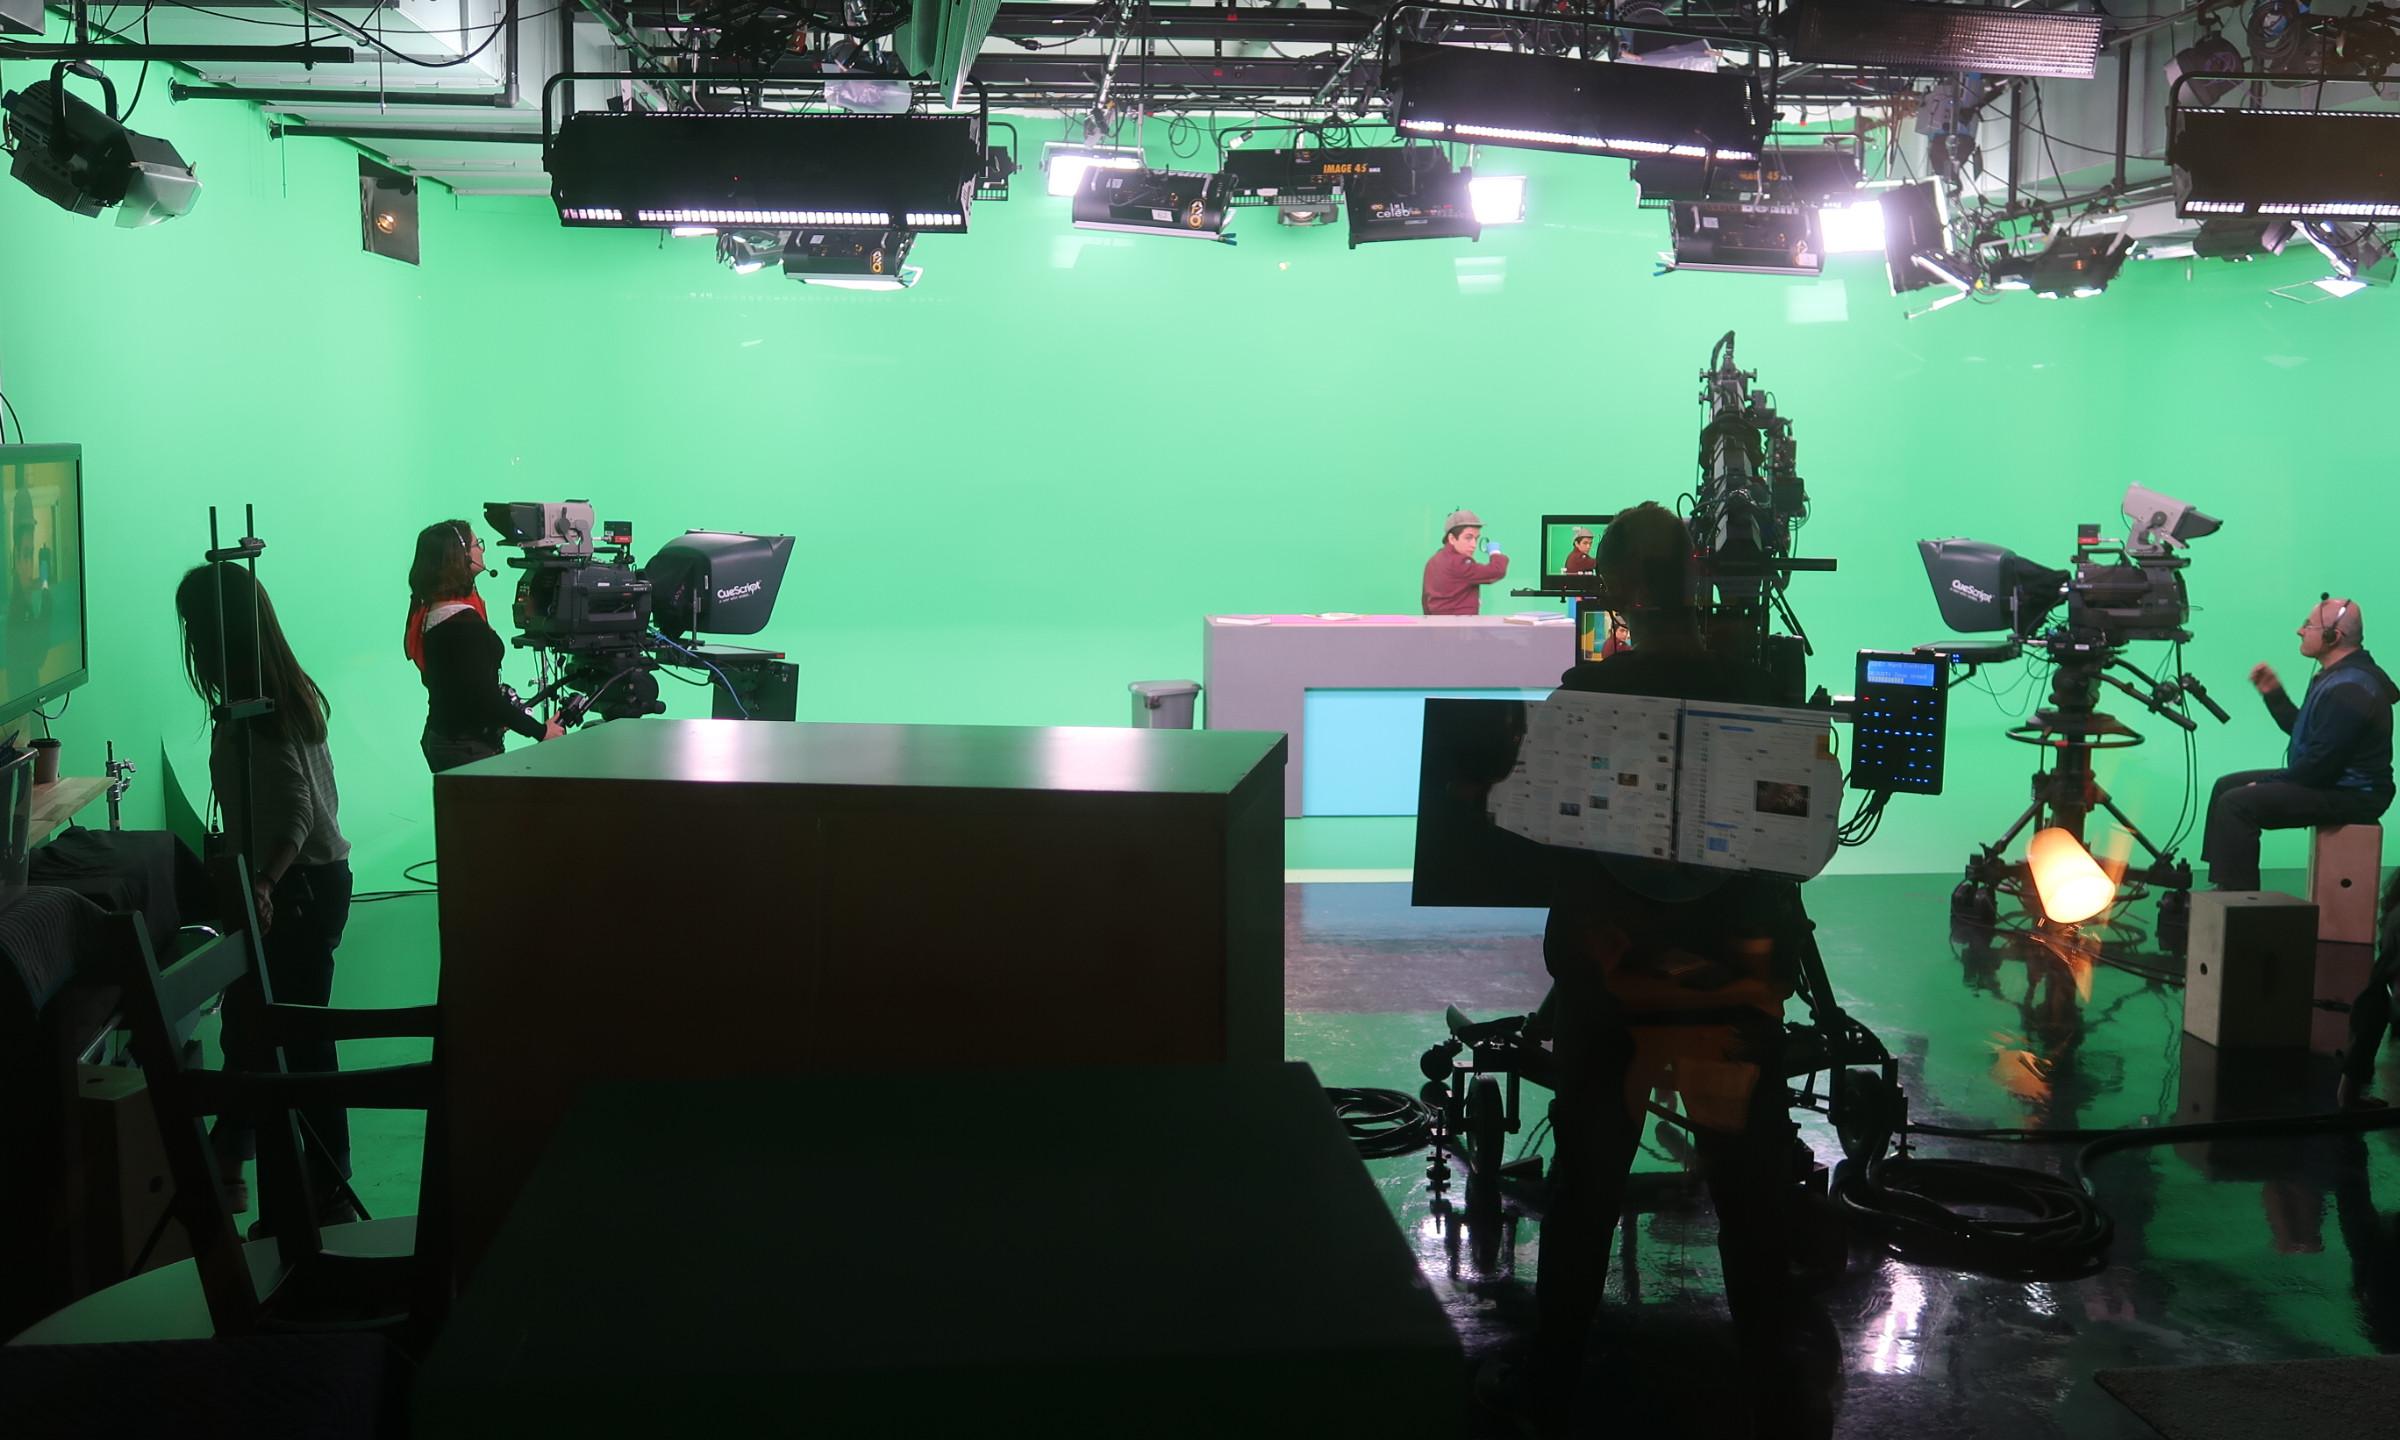 Day 2: Green Screen